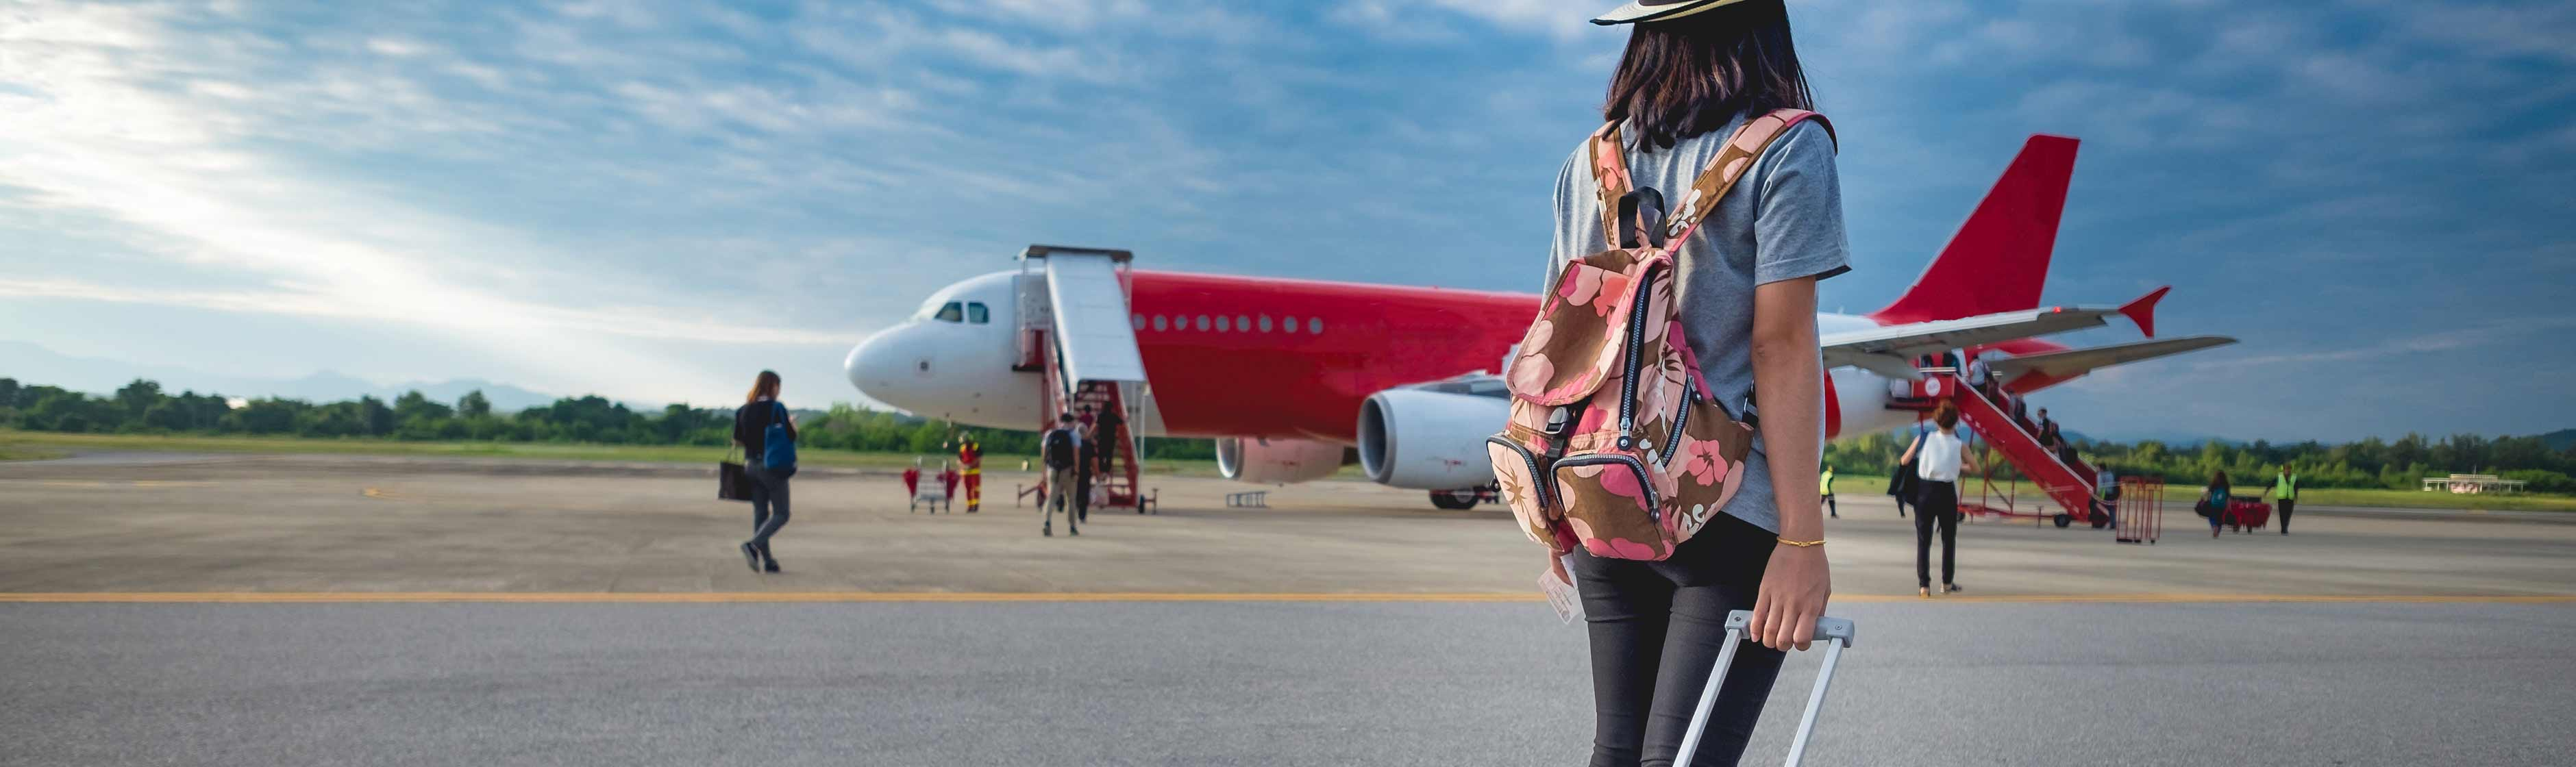 Vrouw met koffer op vliegveld